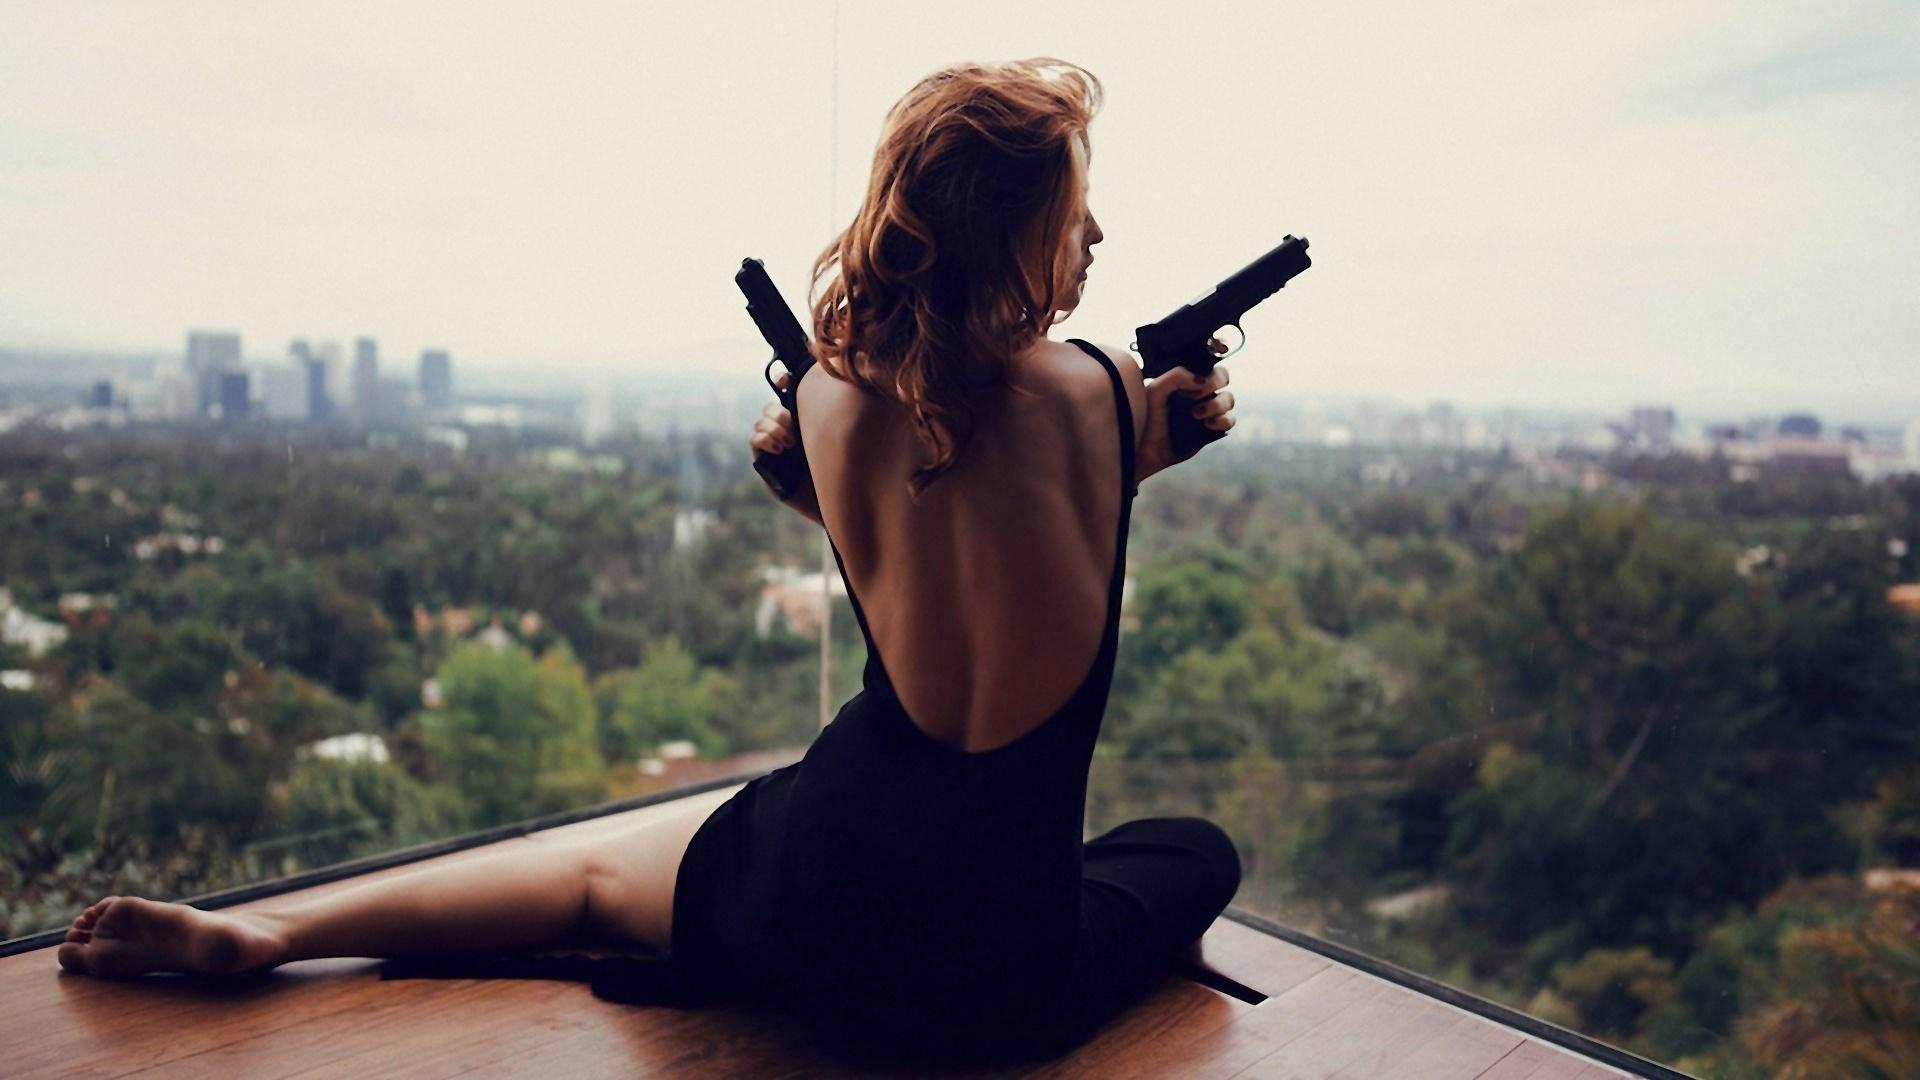 girls_with_guns_026.jpg